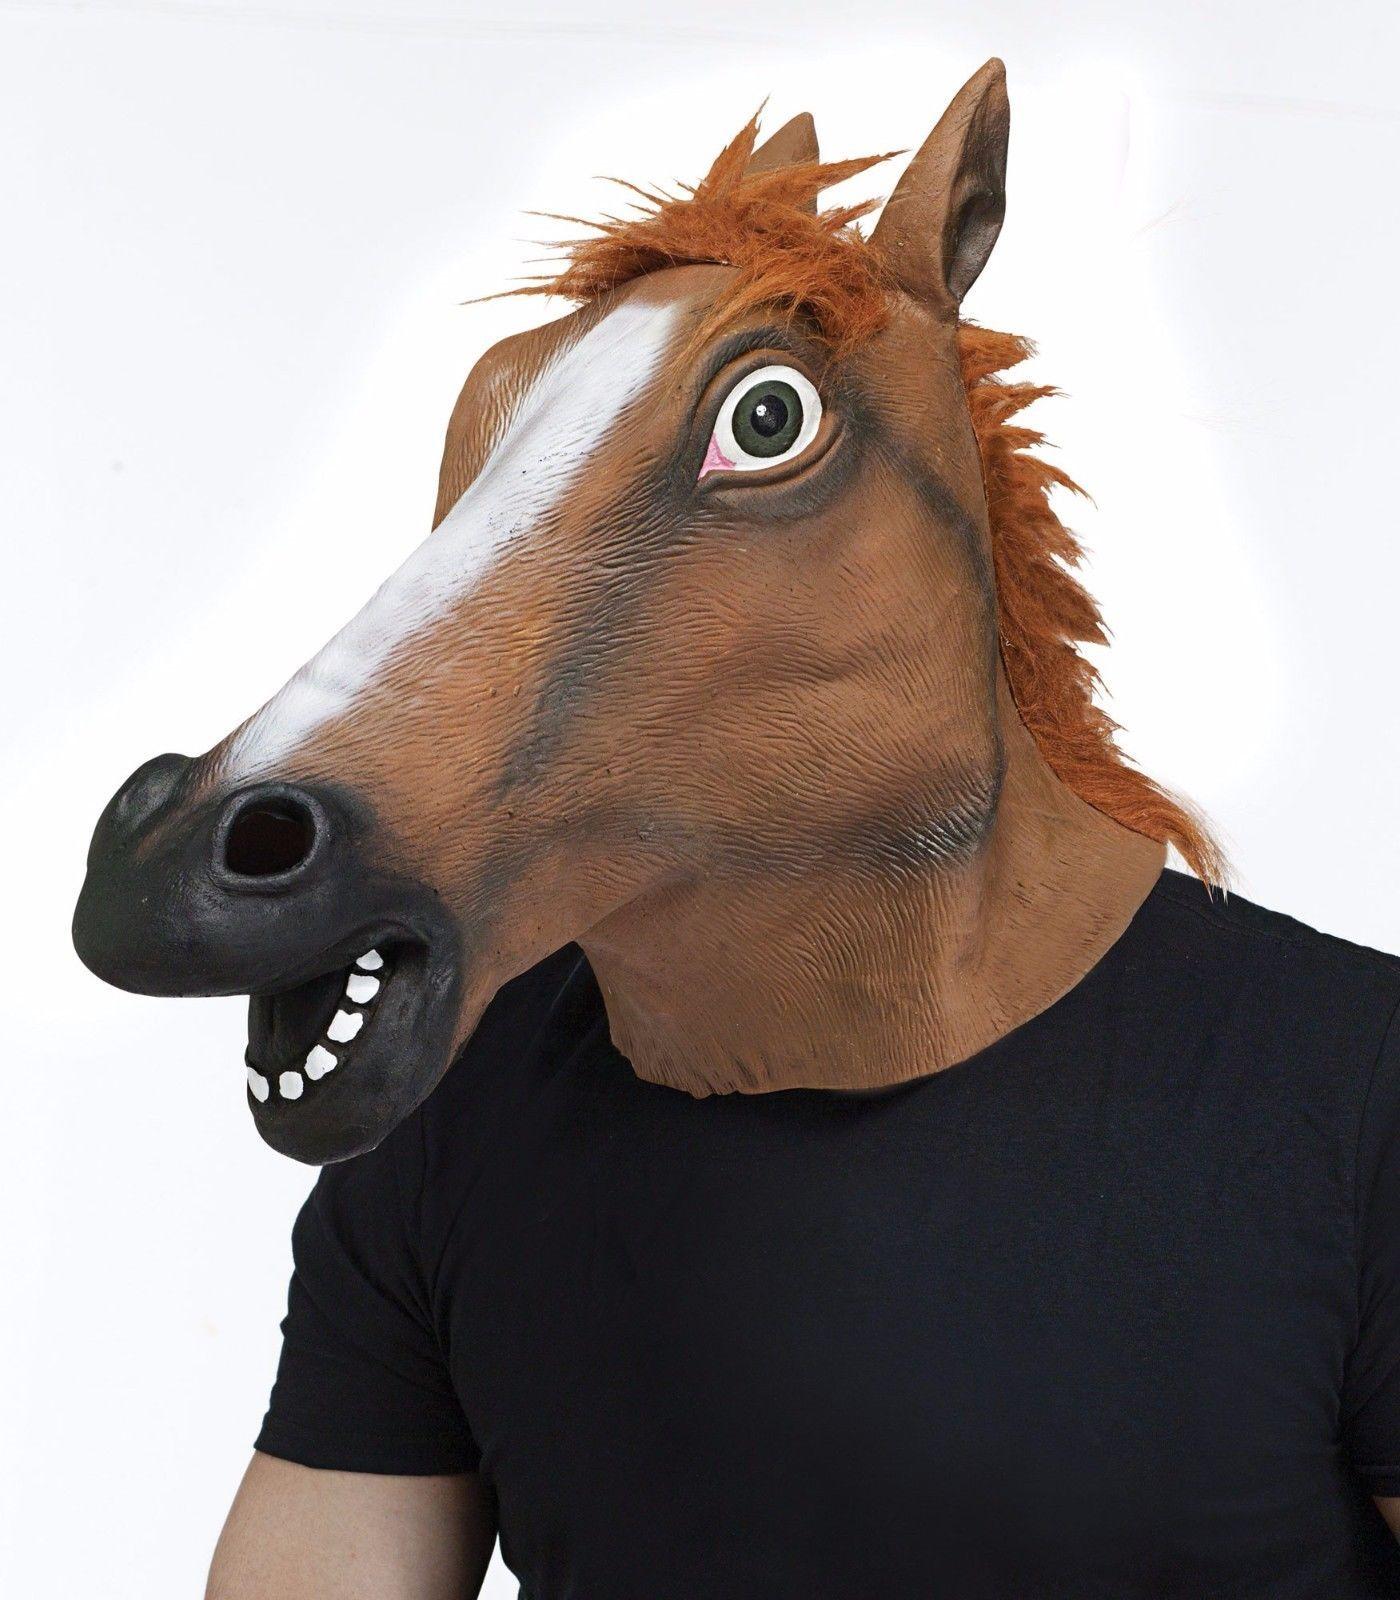 Fun World Horse Animal Zoo Kentucky Derby Adult Halloween Costume Mask 93267